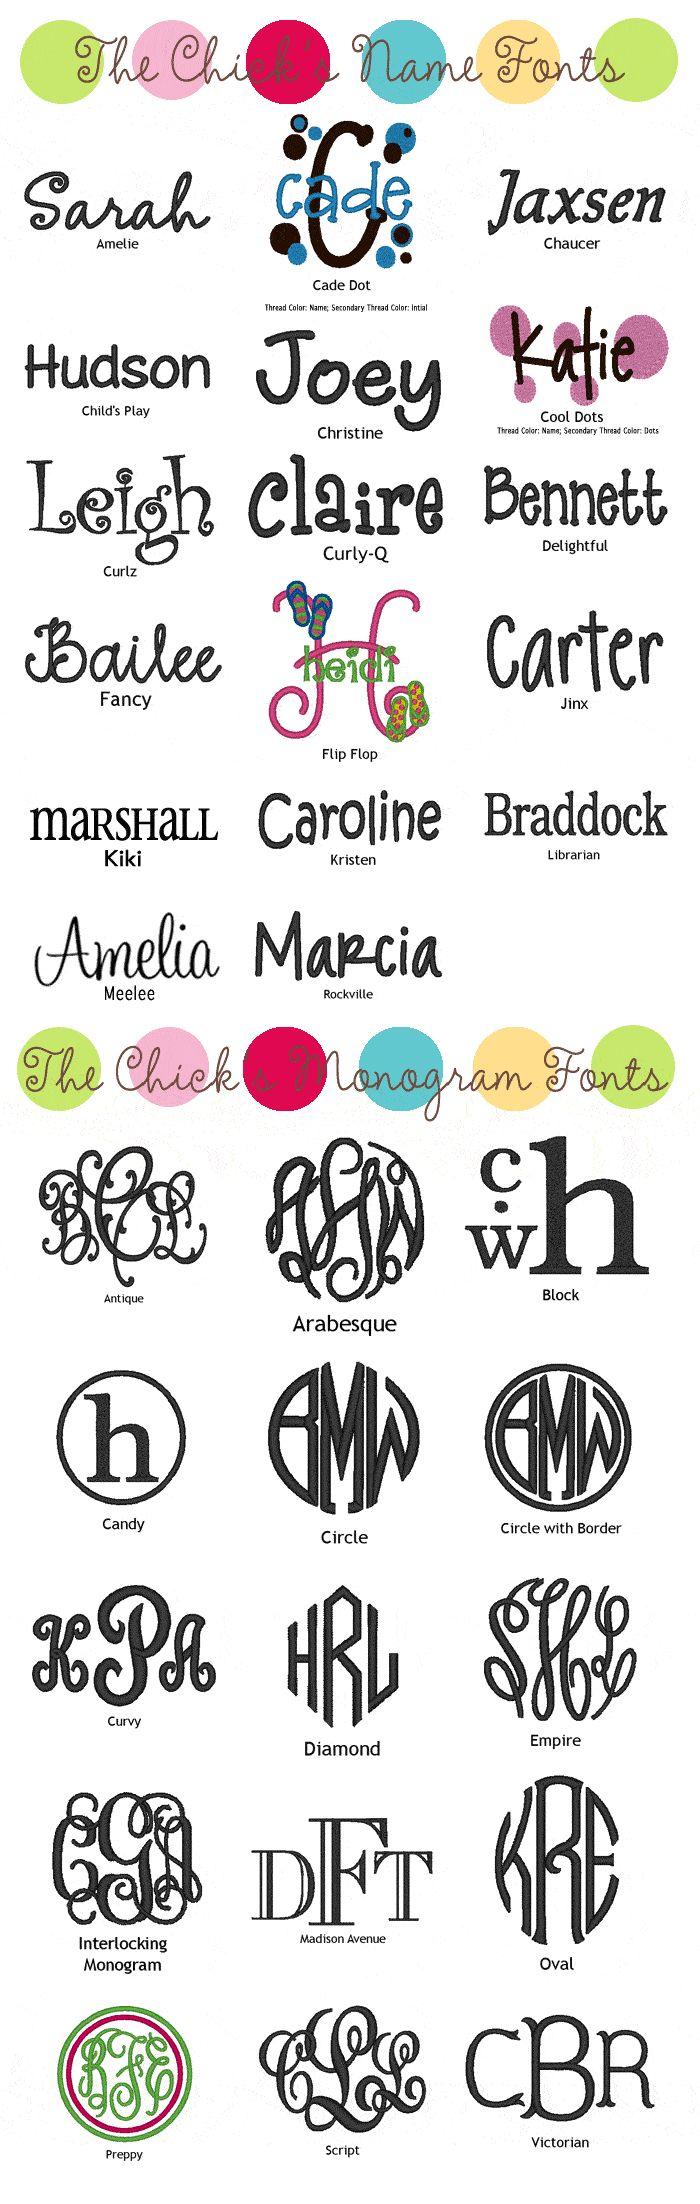 Font styles & monograms.